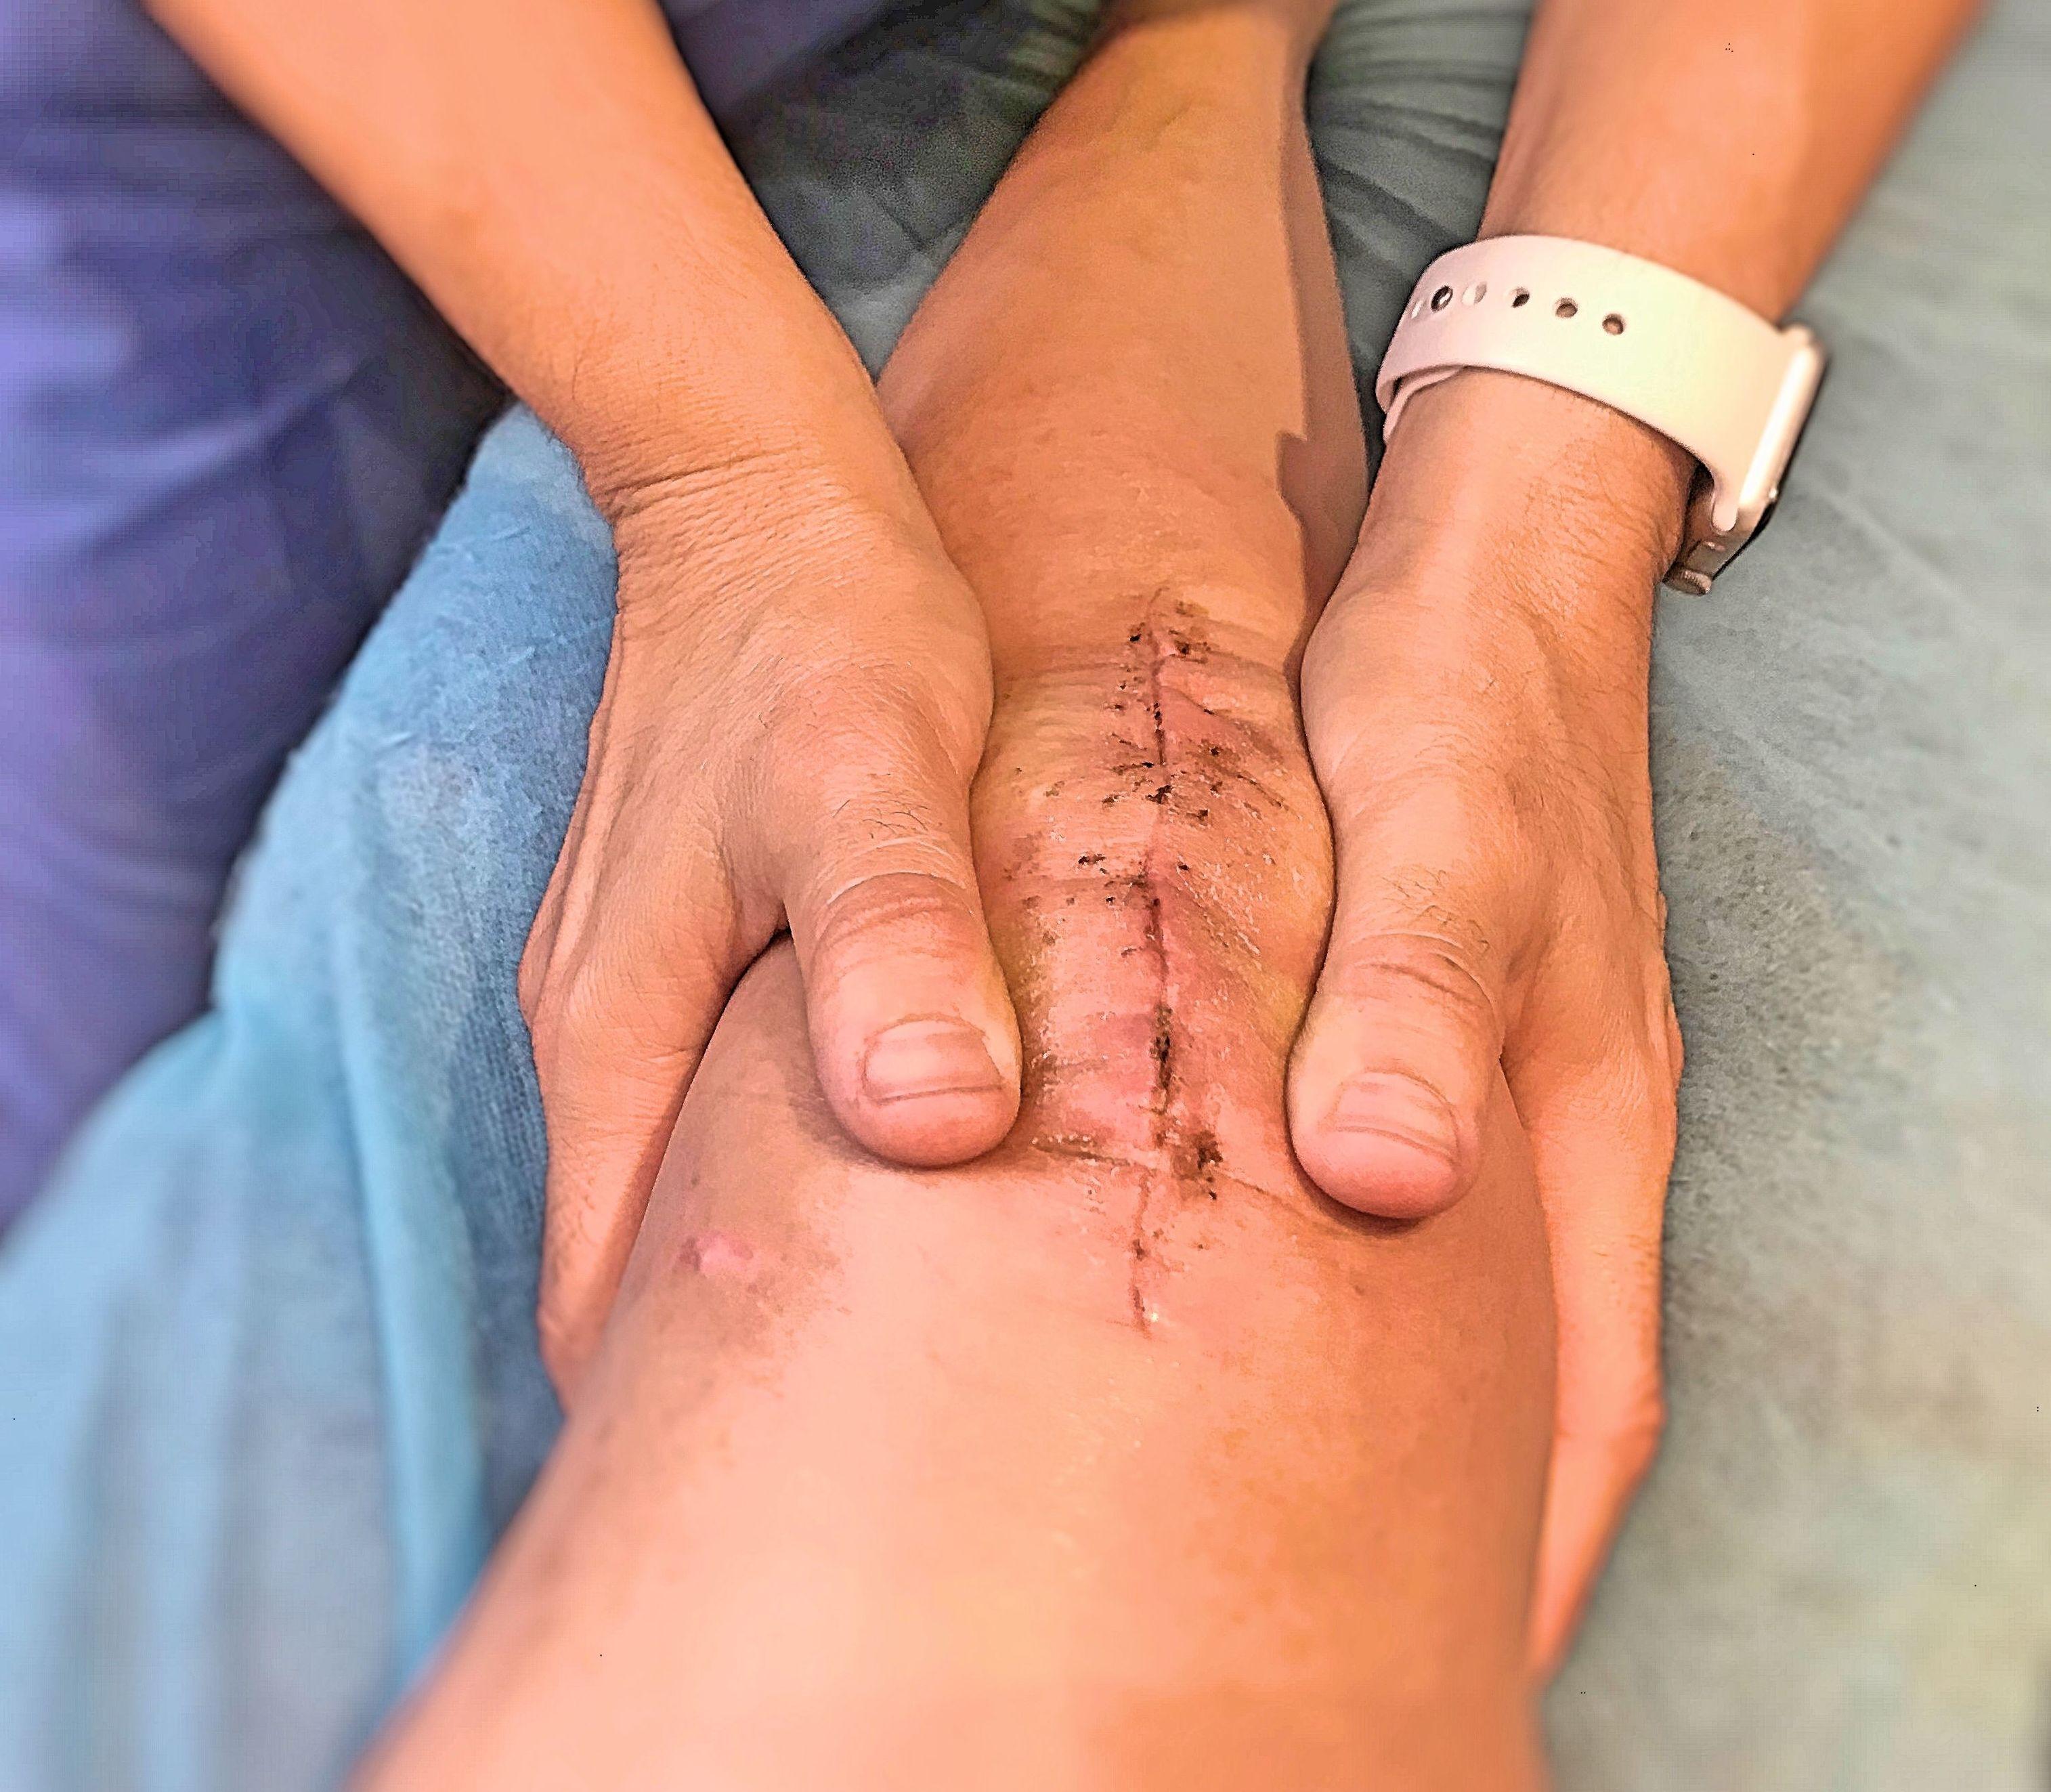 Foto 11 de Fisioterapia en  | Optima Fisioterapia